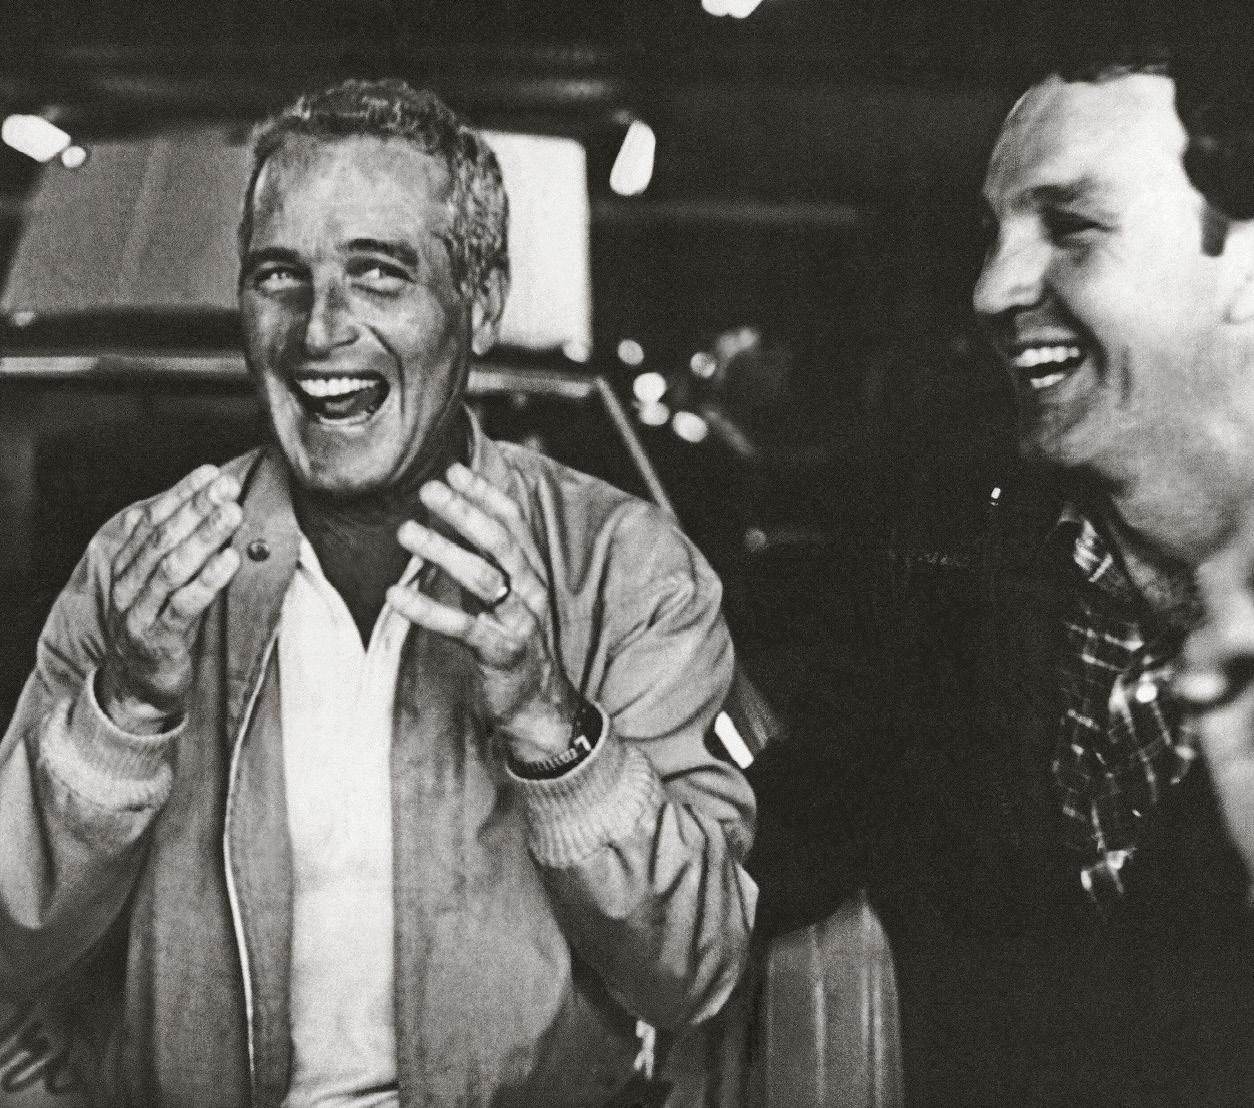 Barrett was a close friend of actor and race fan Paul Newman